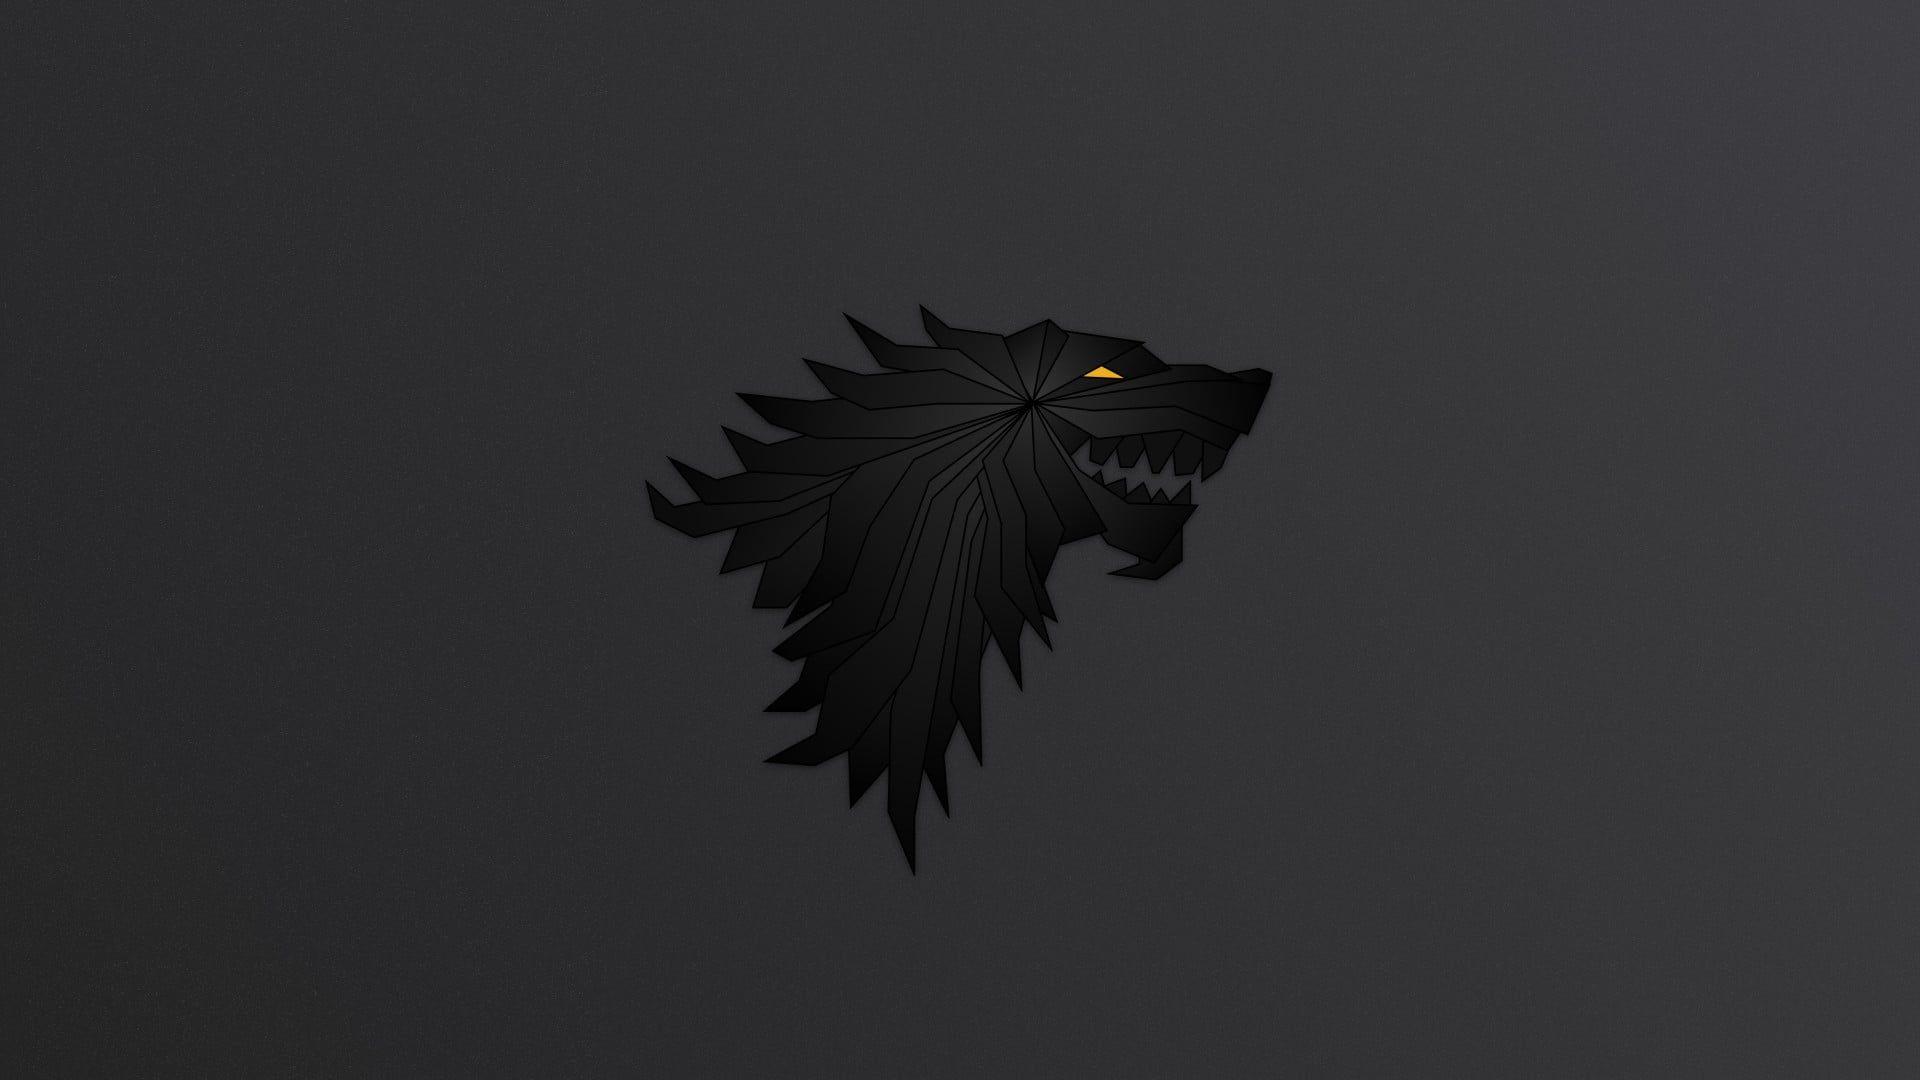 Black Dragon Illustration Game Of Thrones Wolf Logo 1080p Wallpaper Hdwallpaper Desktop In 2021 Stark Sigil Wallpaper 4k Dragon Illustration